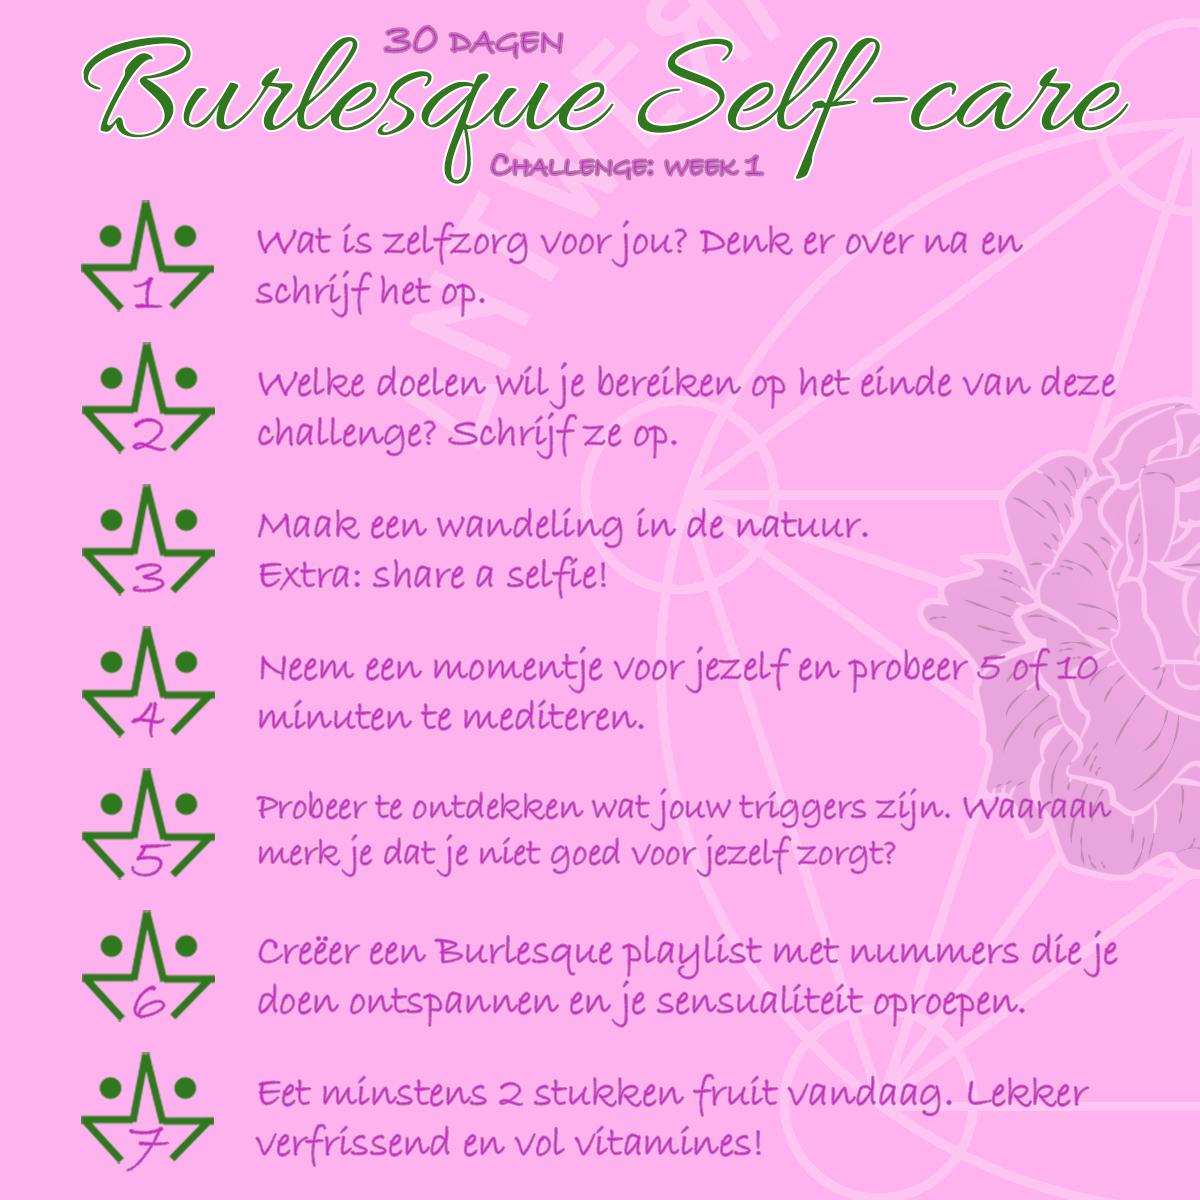 BurlyCare week 1